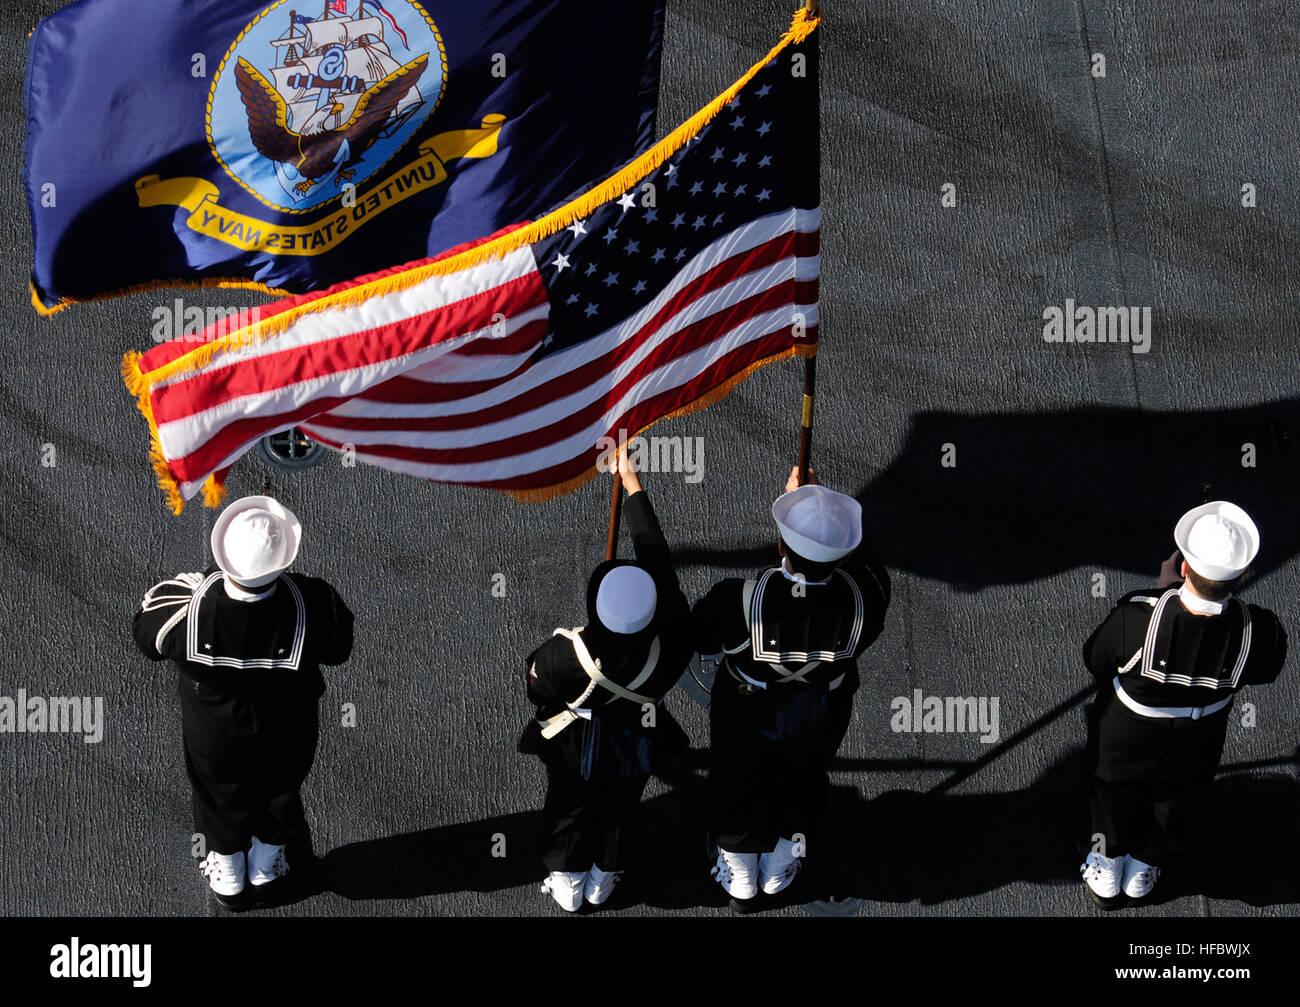 Uss John C Stennis Navy Pacific Ocean Stock Photos & Uss John C